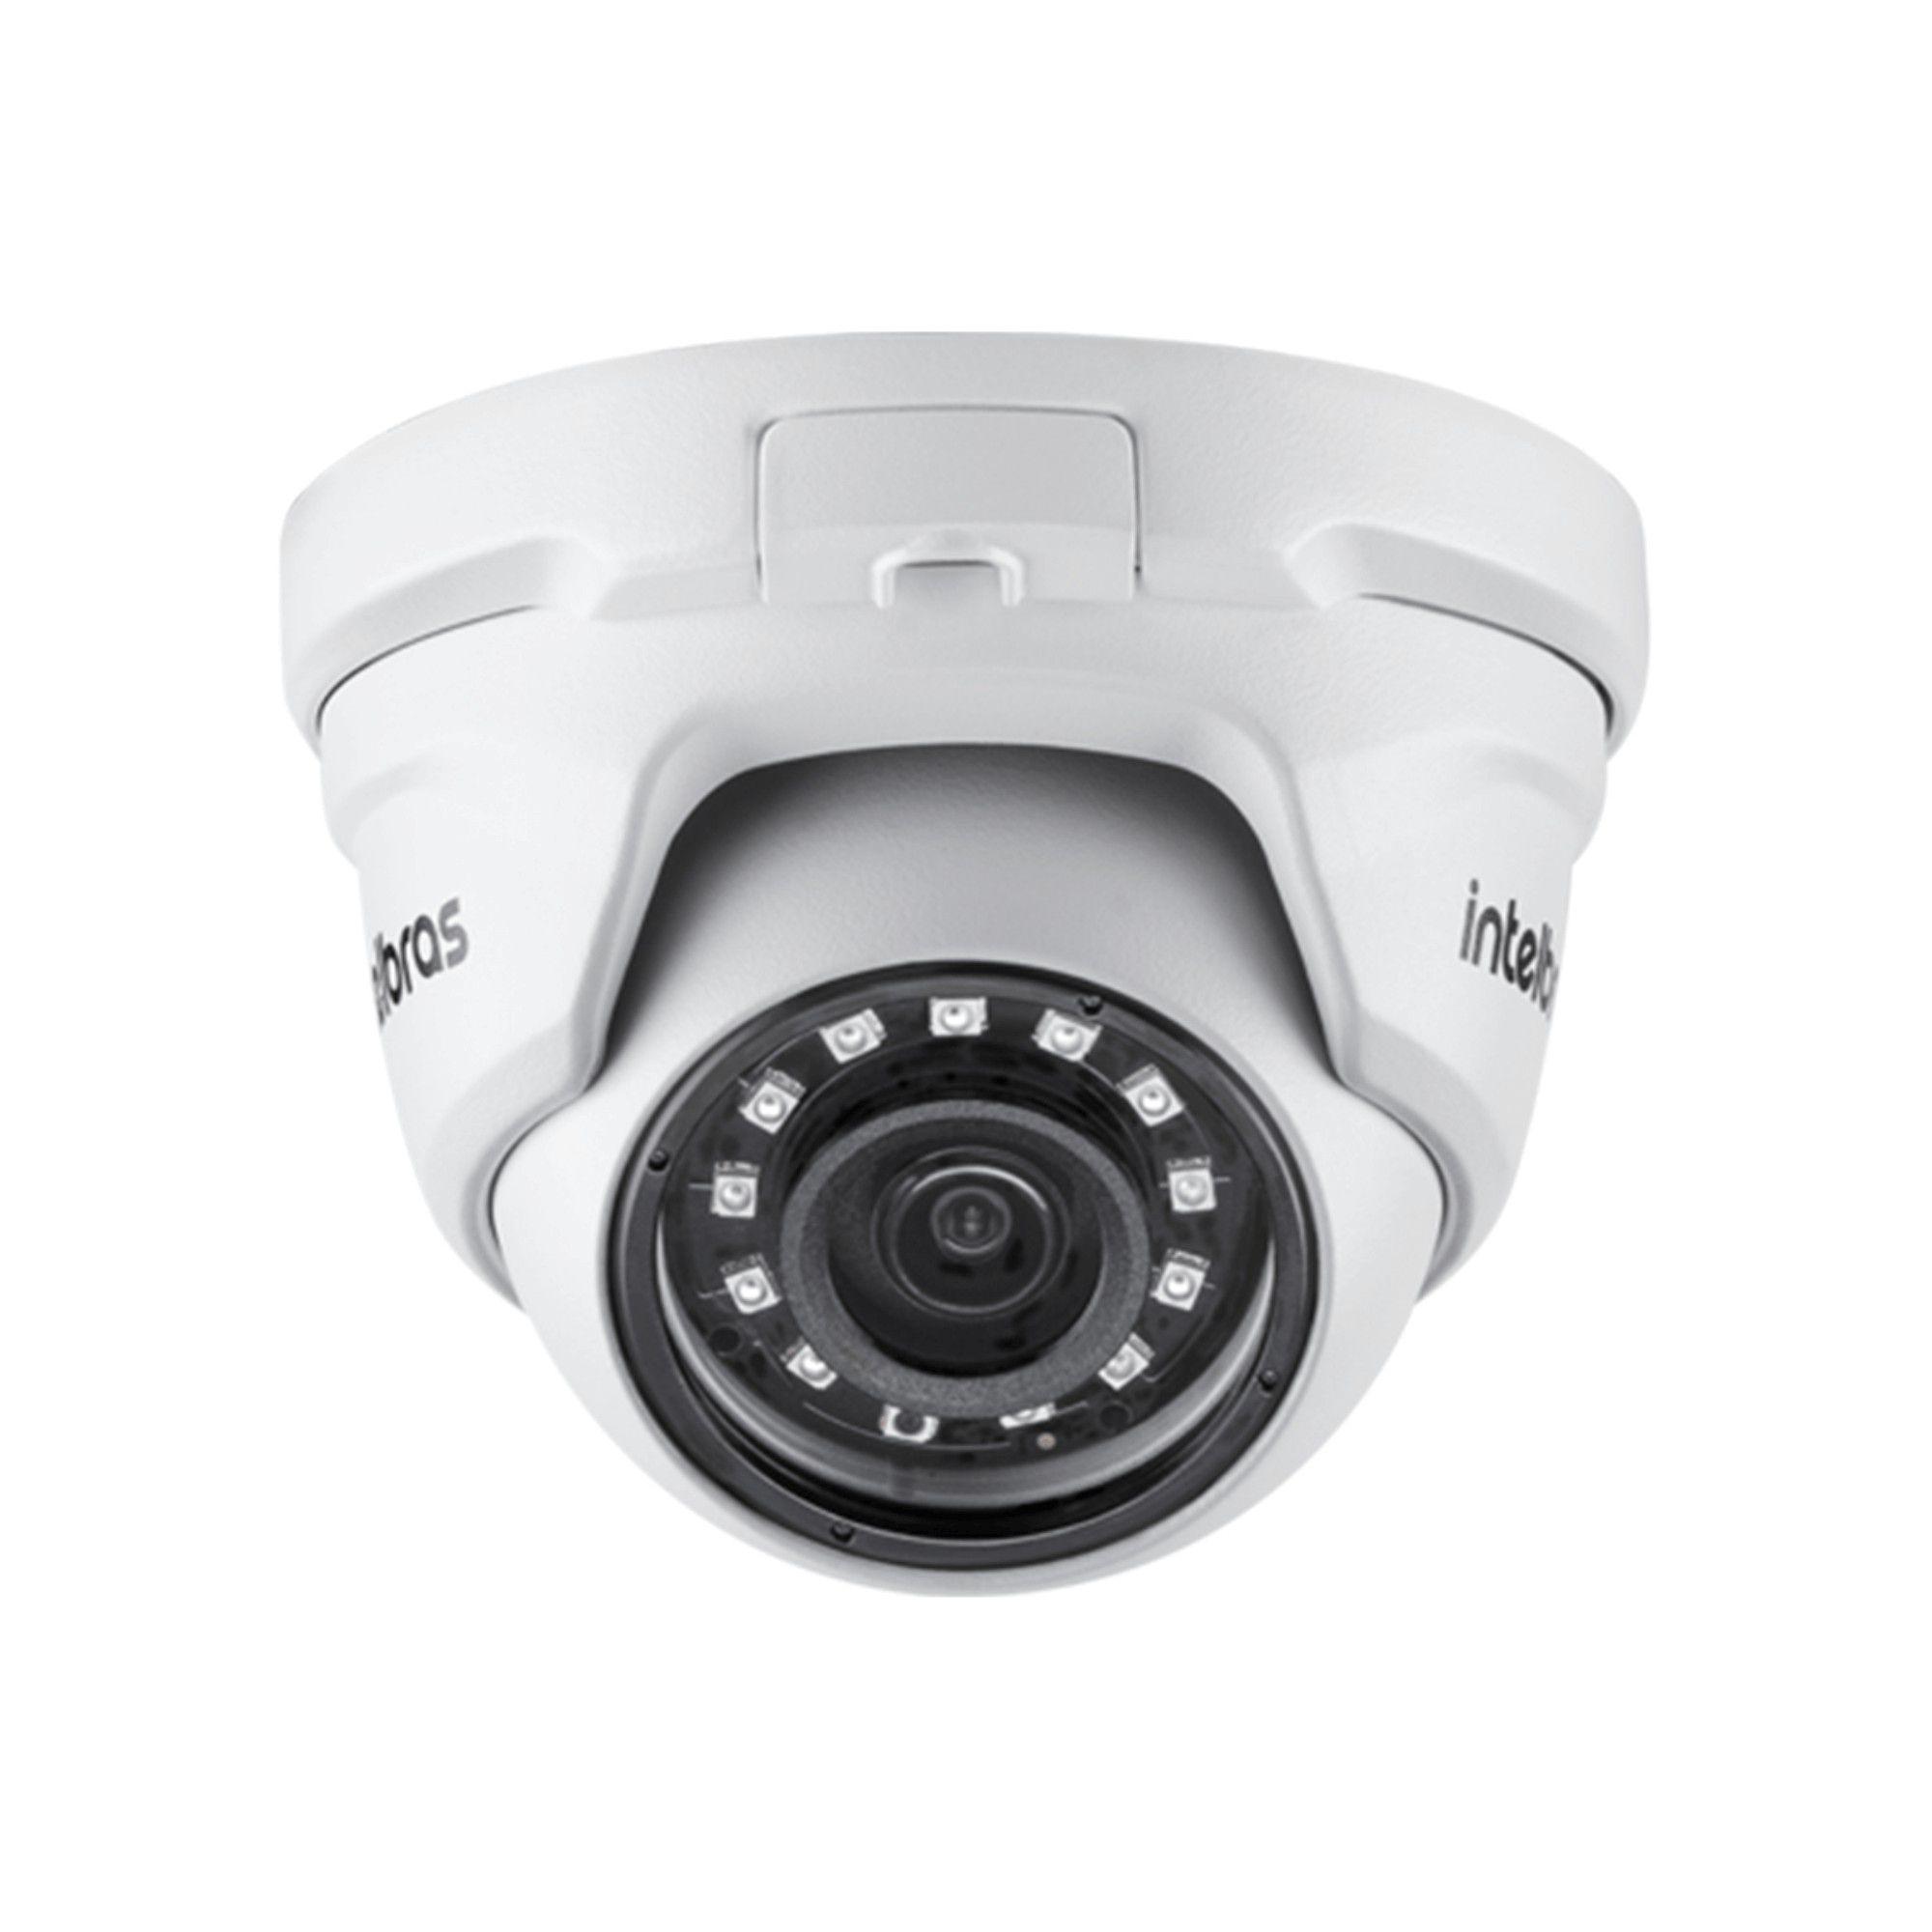 Kit CFTV Intelbras Completo 8 Câmeras AHD 720p DVR 8 Canais